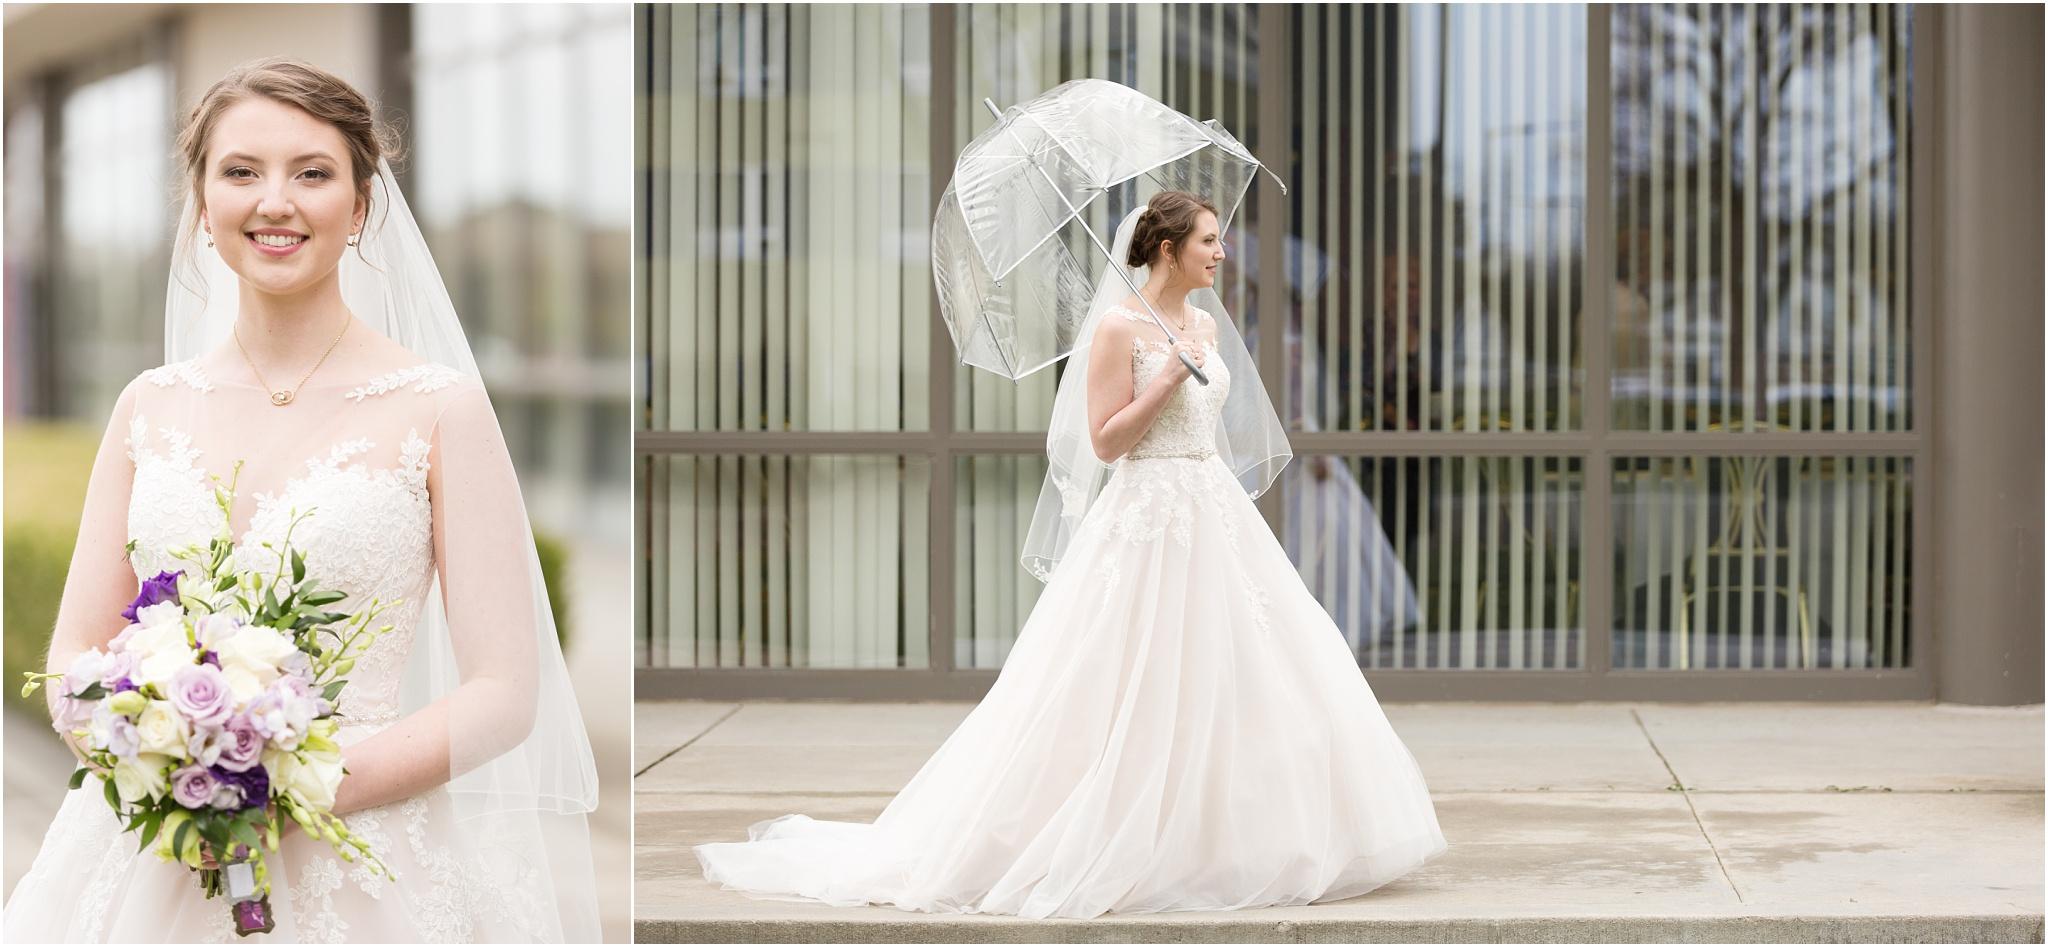 Wedding Photography_Meridian Idaho_Nampa Idaho_Leah Southwick Photography_0068.jpg